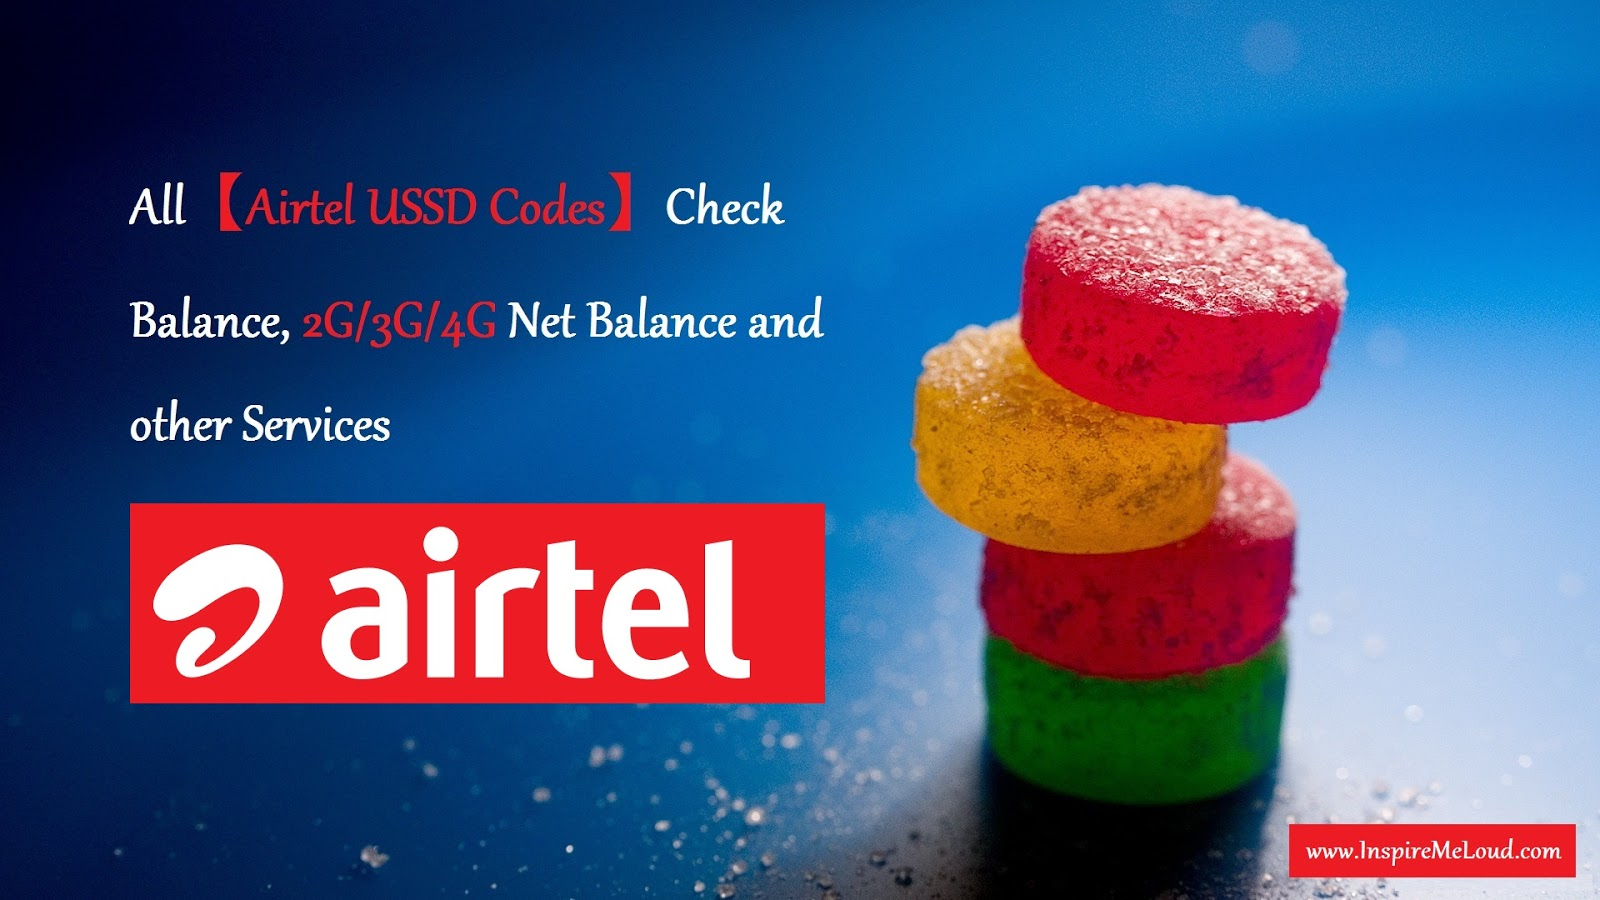 All Airtel USSD Codes List